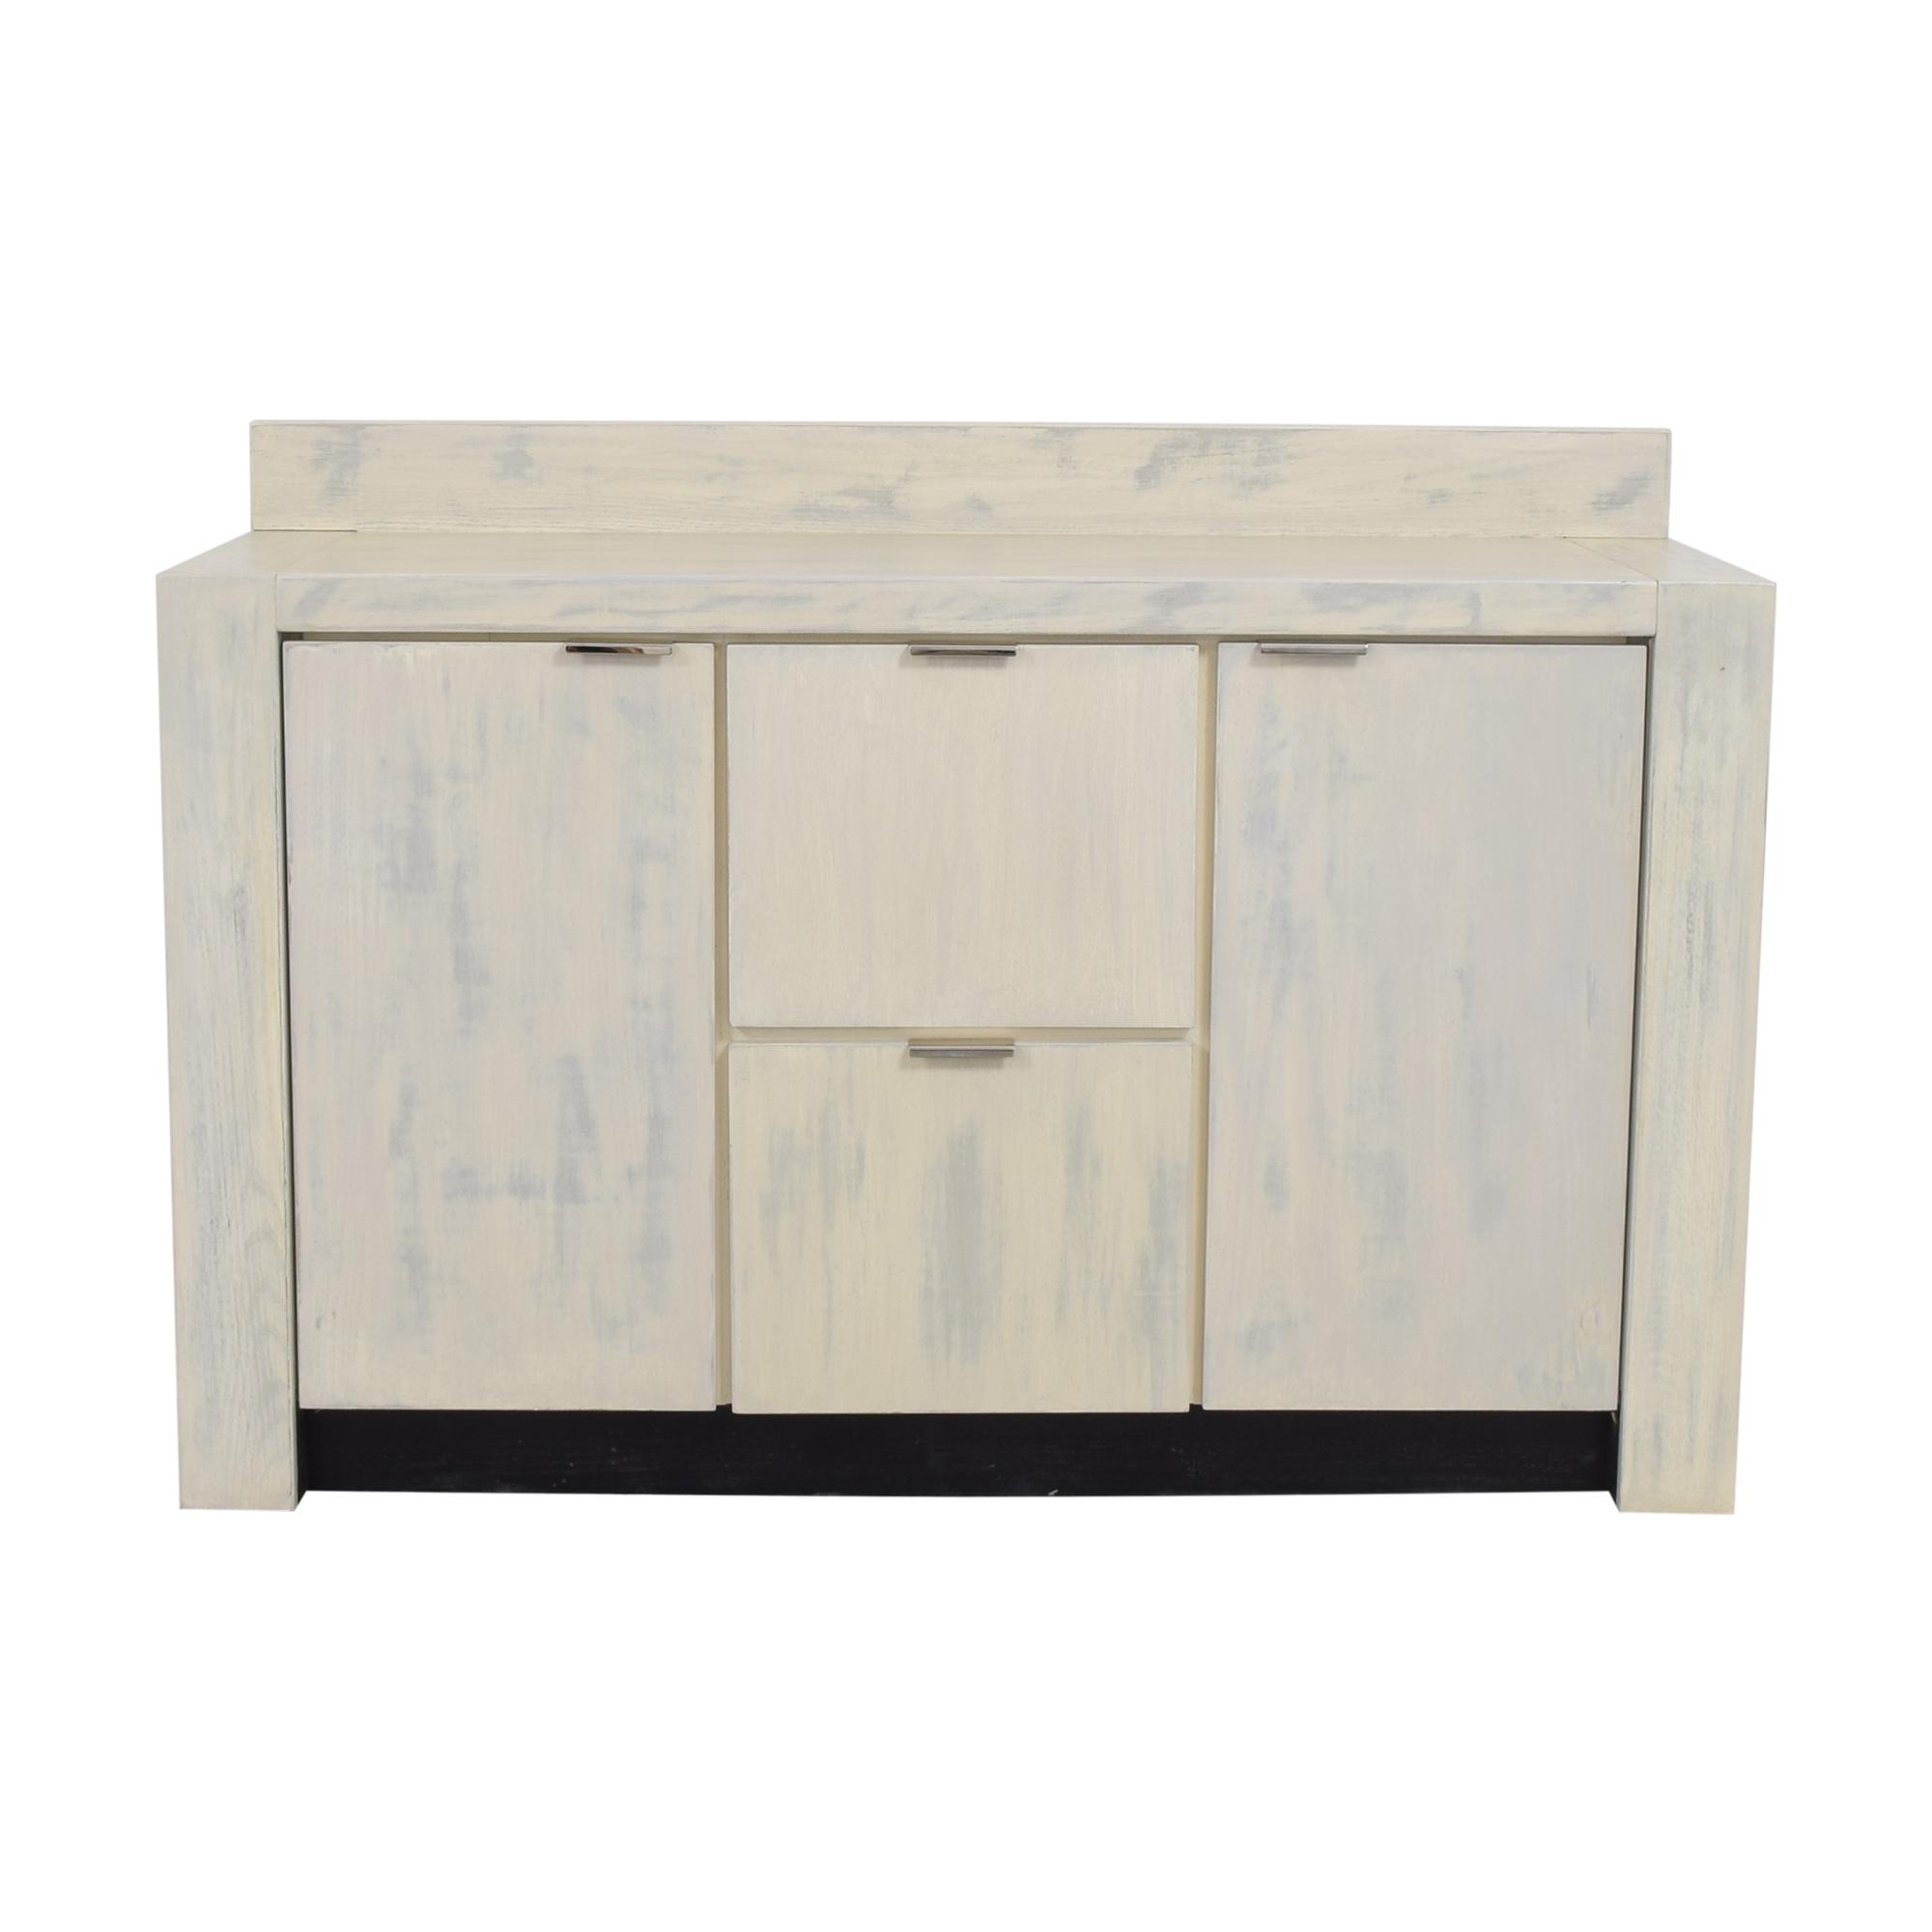 Custom Two Door Sideboard / Cabinets & Sideboards